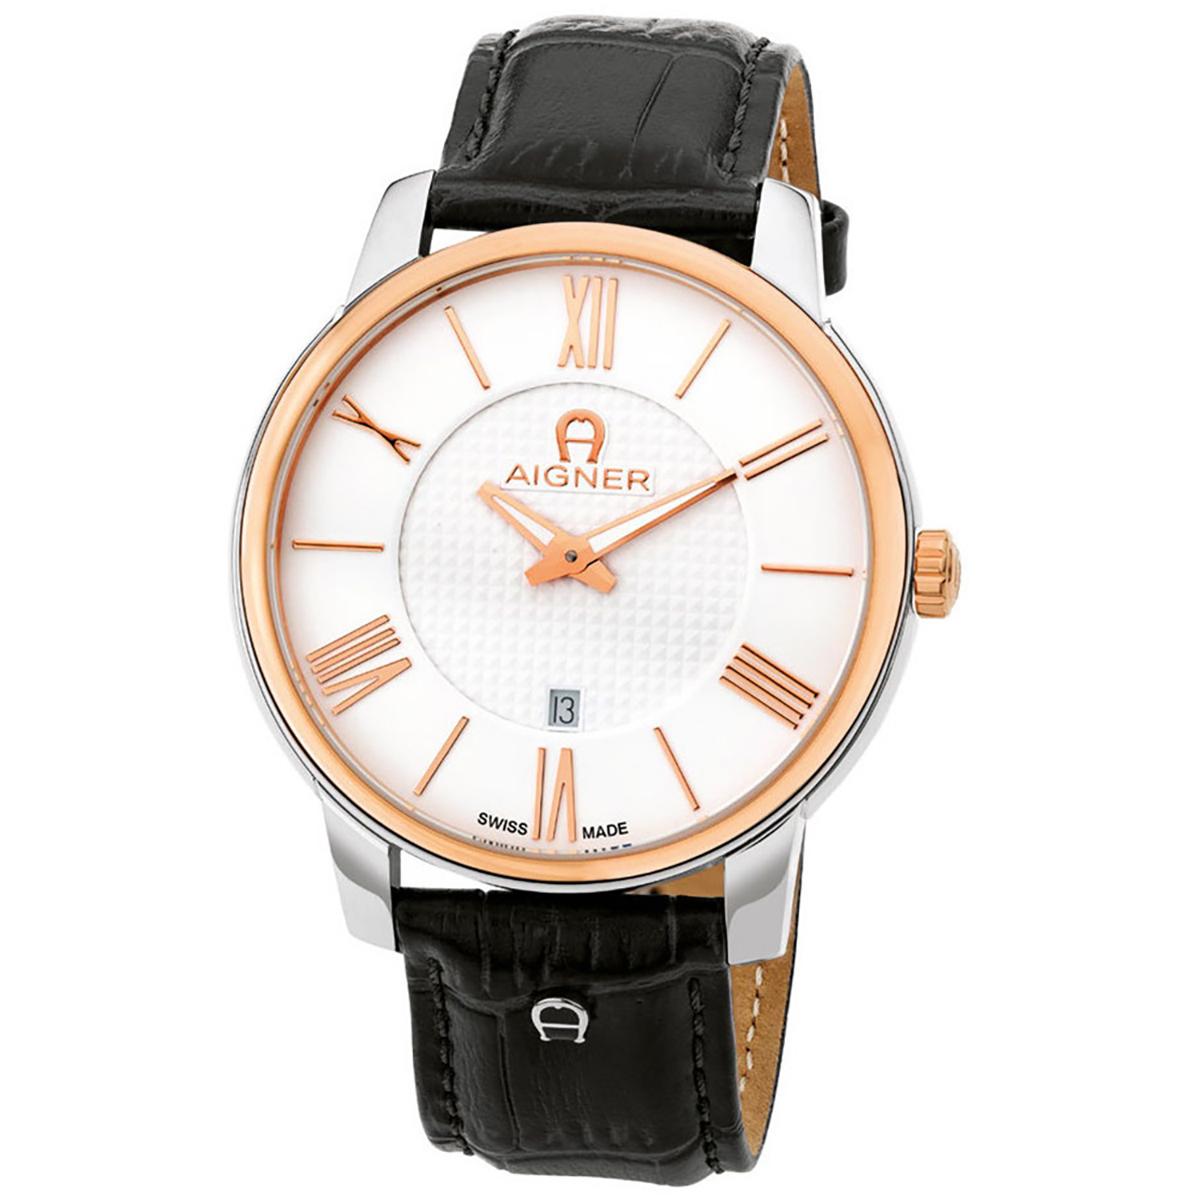 ساعت مچی عقربه ای مردانه اگنر مدل A24060 12